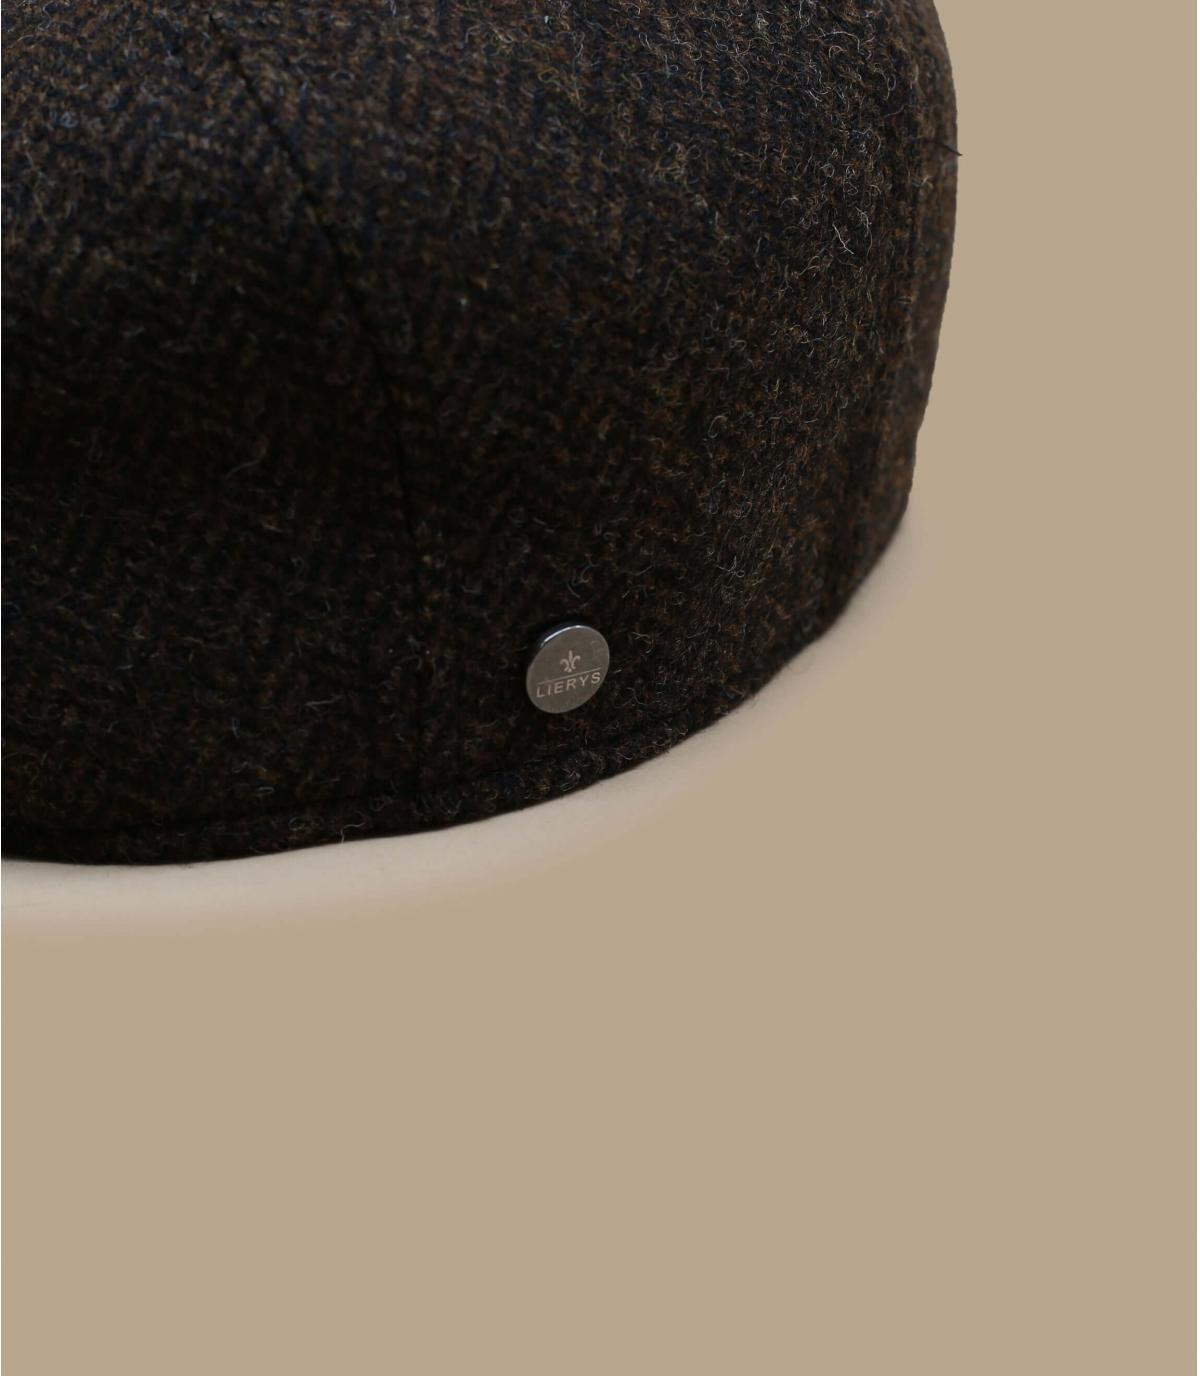 Detalles Britton Wool Herringbone brown imagen 2